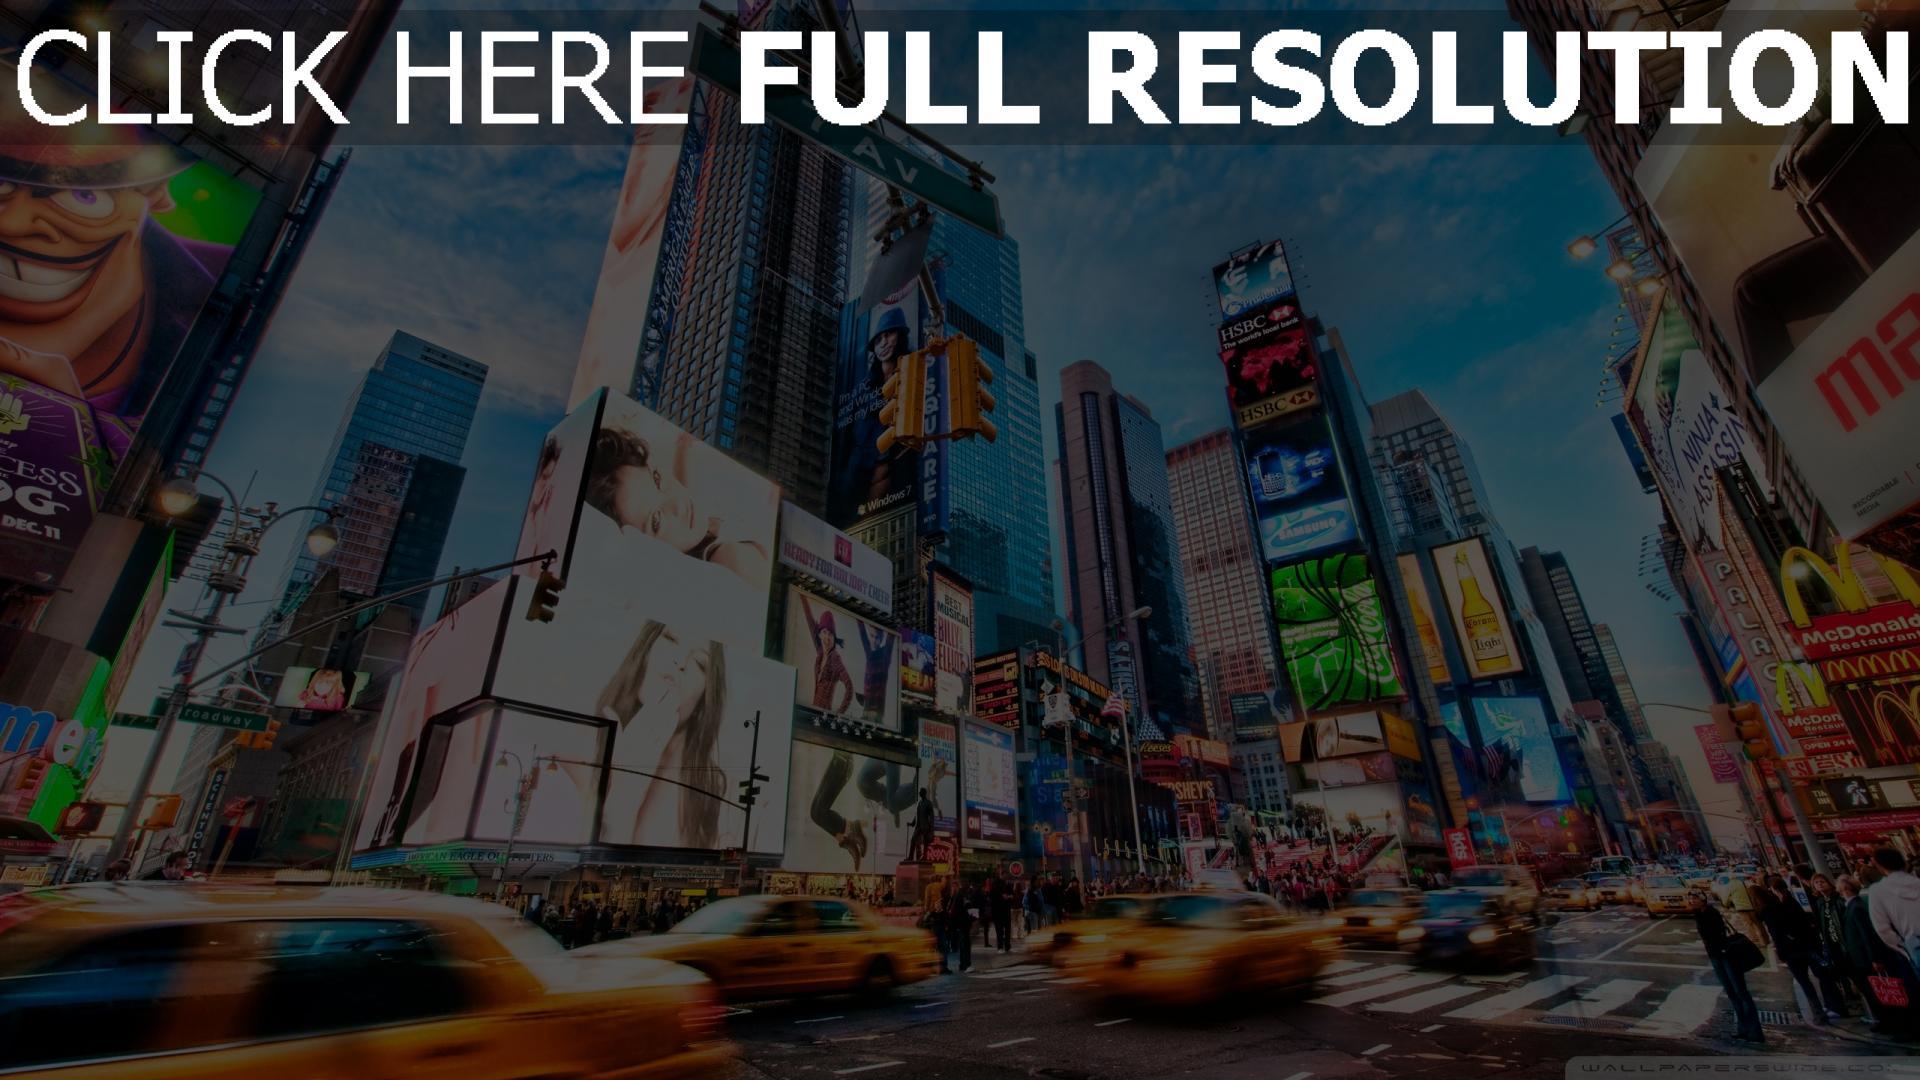 t l charger 1920x1080 full hd fond d 39 cran new york rue gratte ciel images et photos. Black Bedroom Furniture Sets. Home Design Ideas